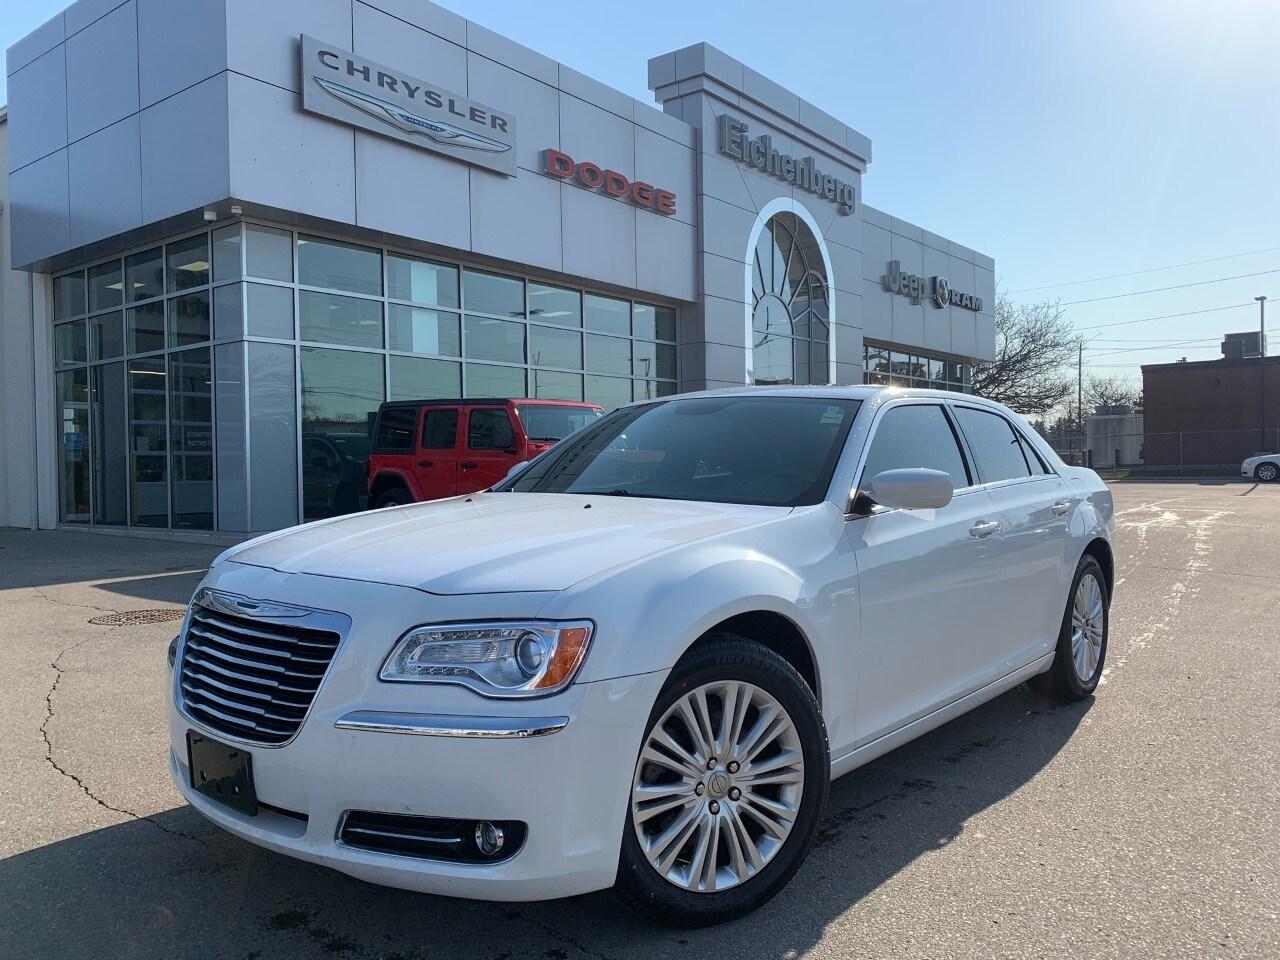 used 2014 Chrysler 300 car, priced at $14,599